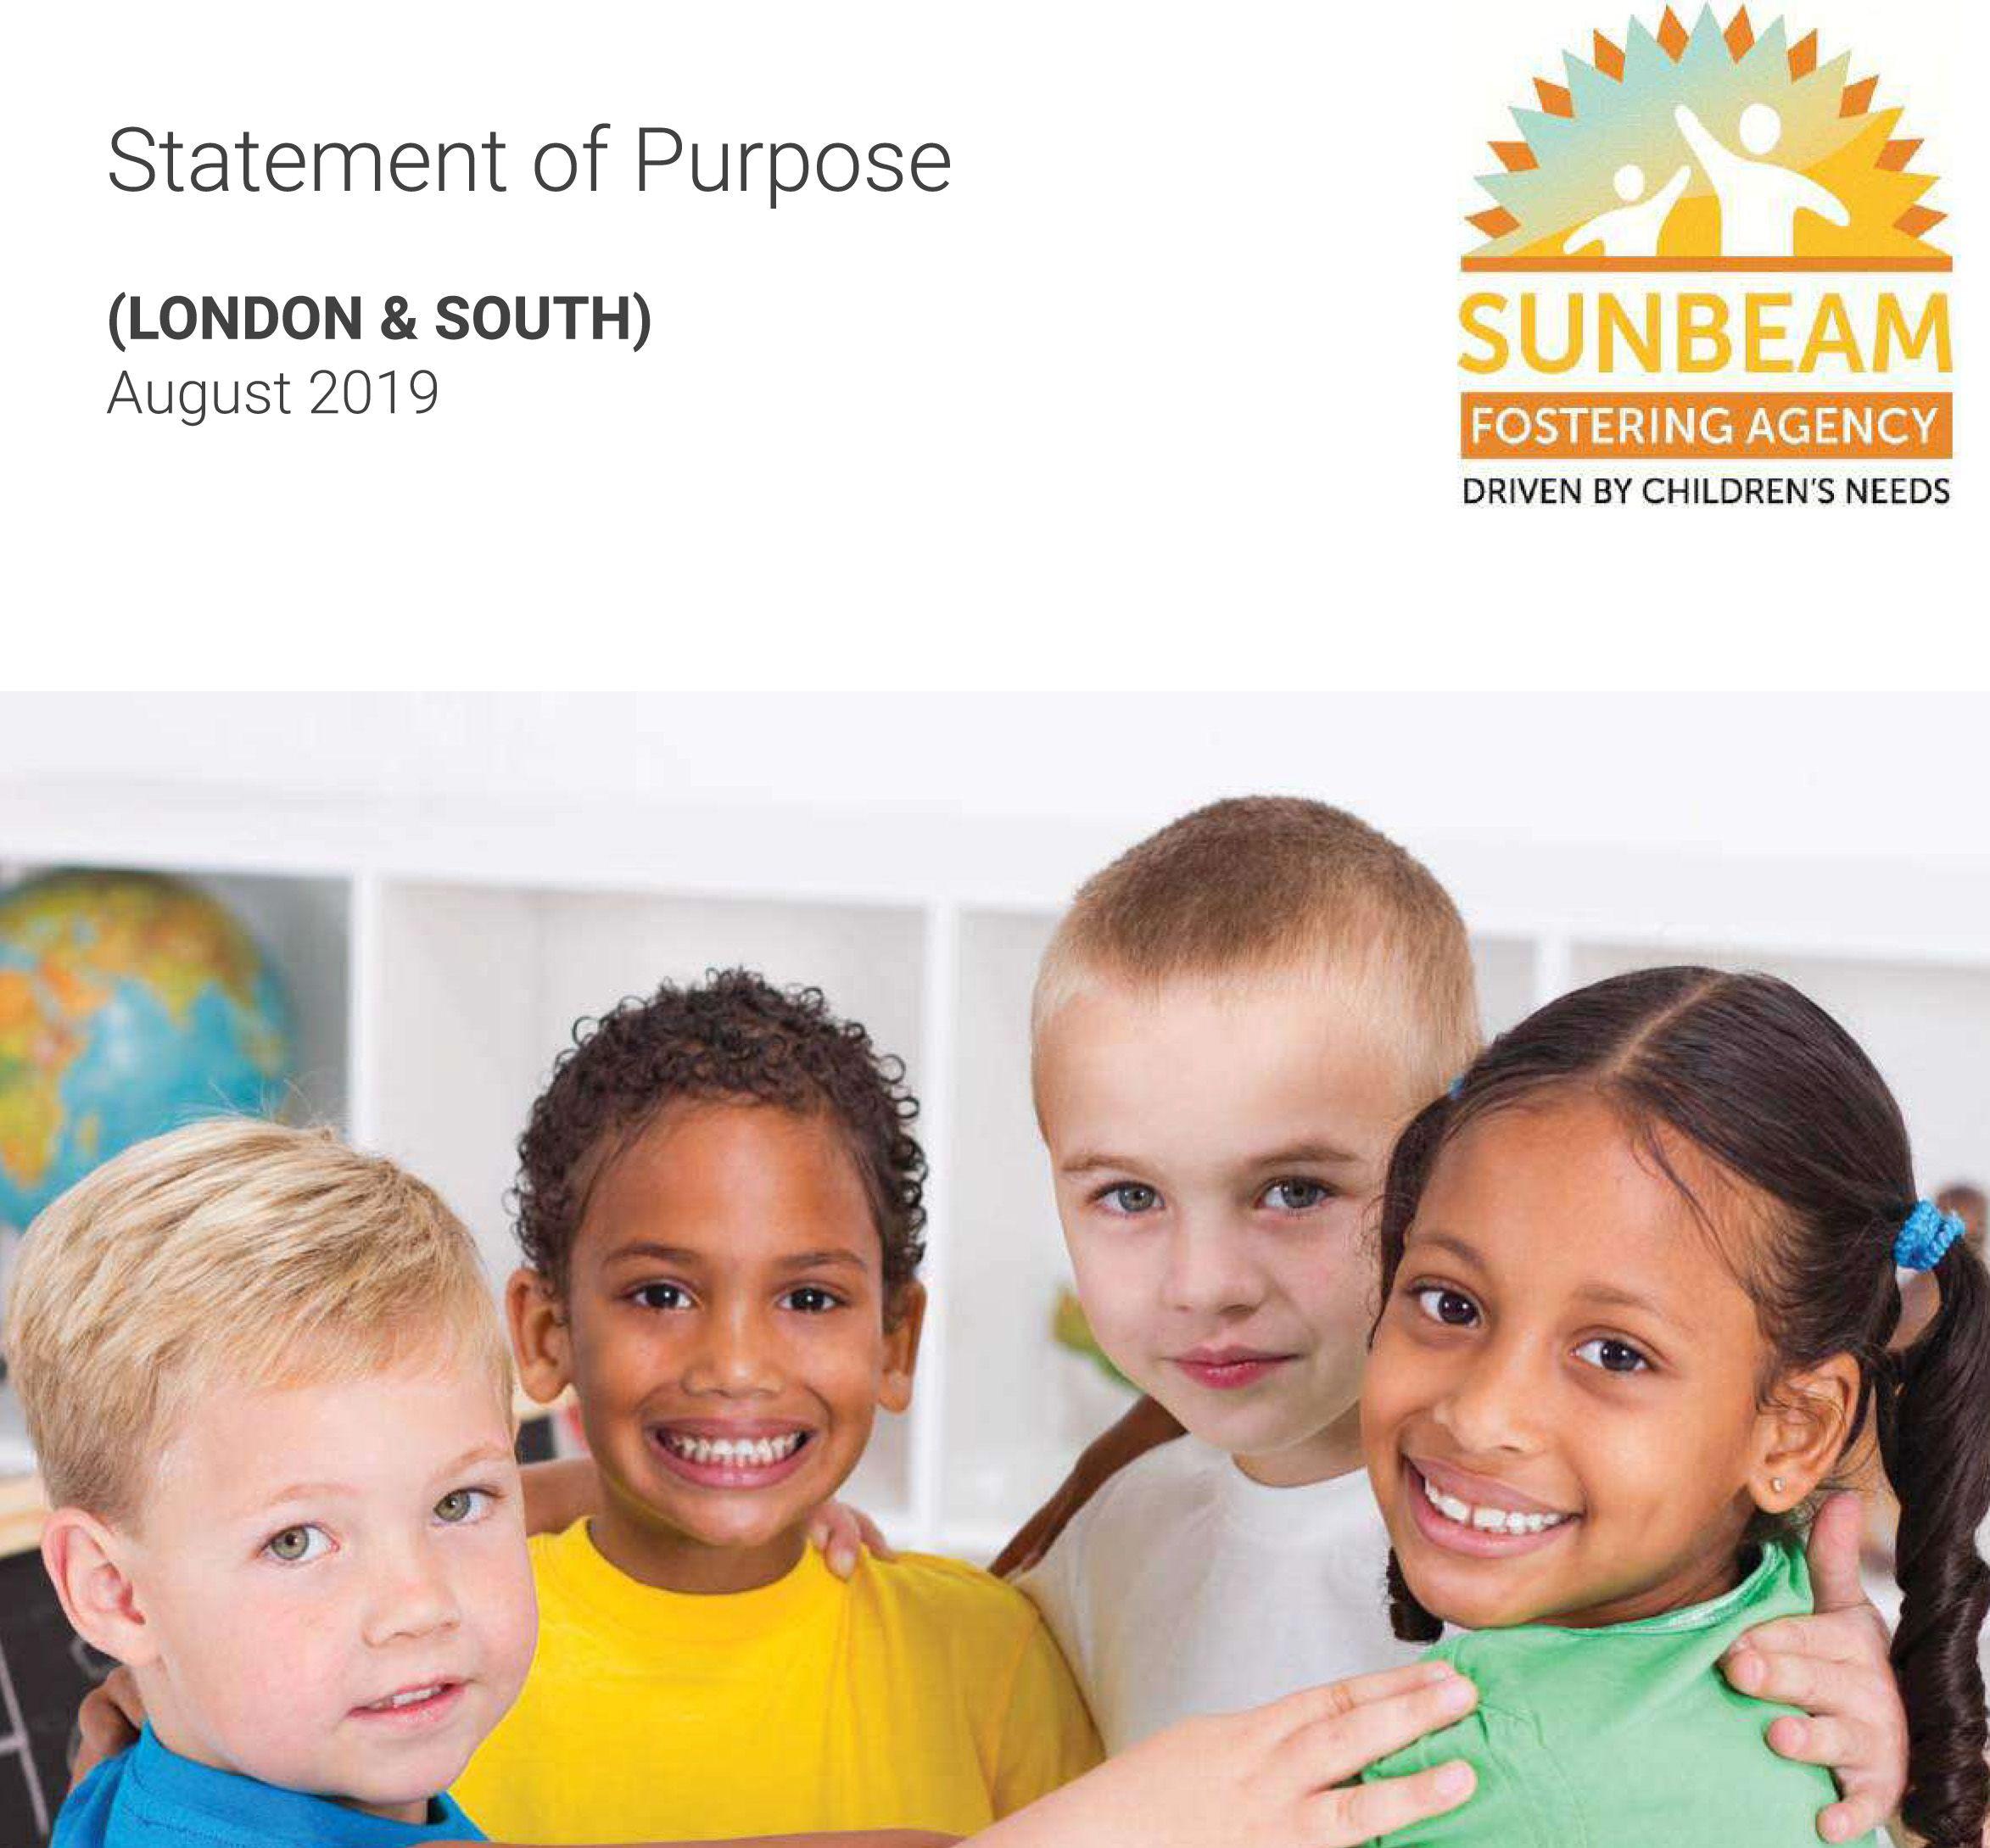 Statement of Purpose LDN